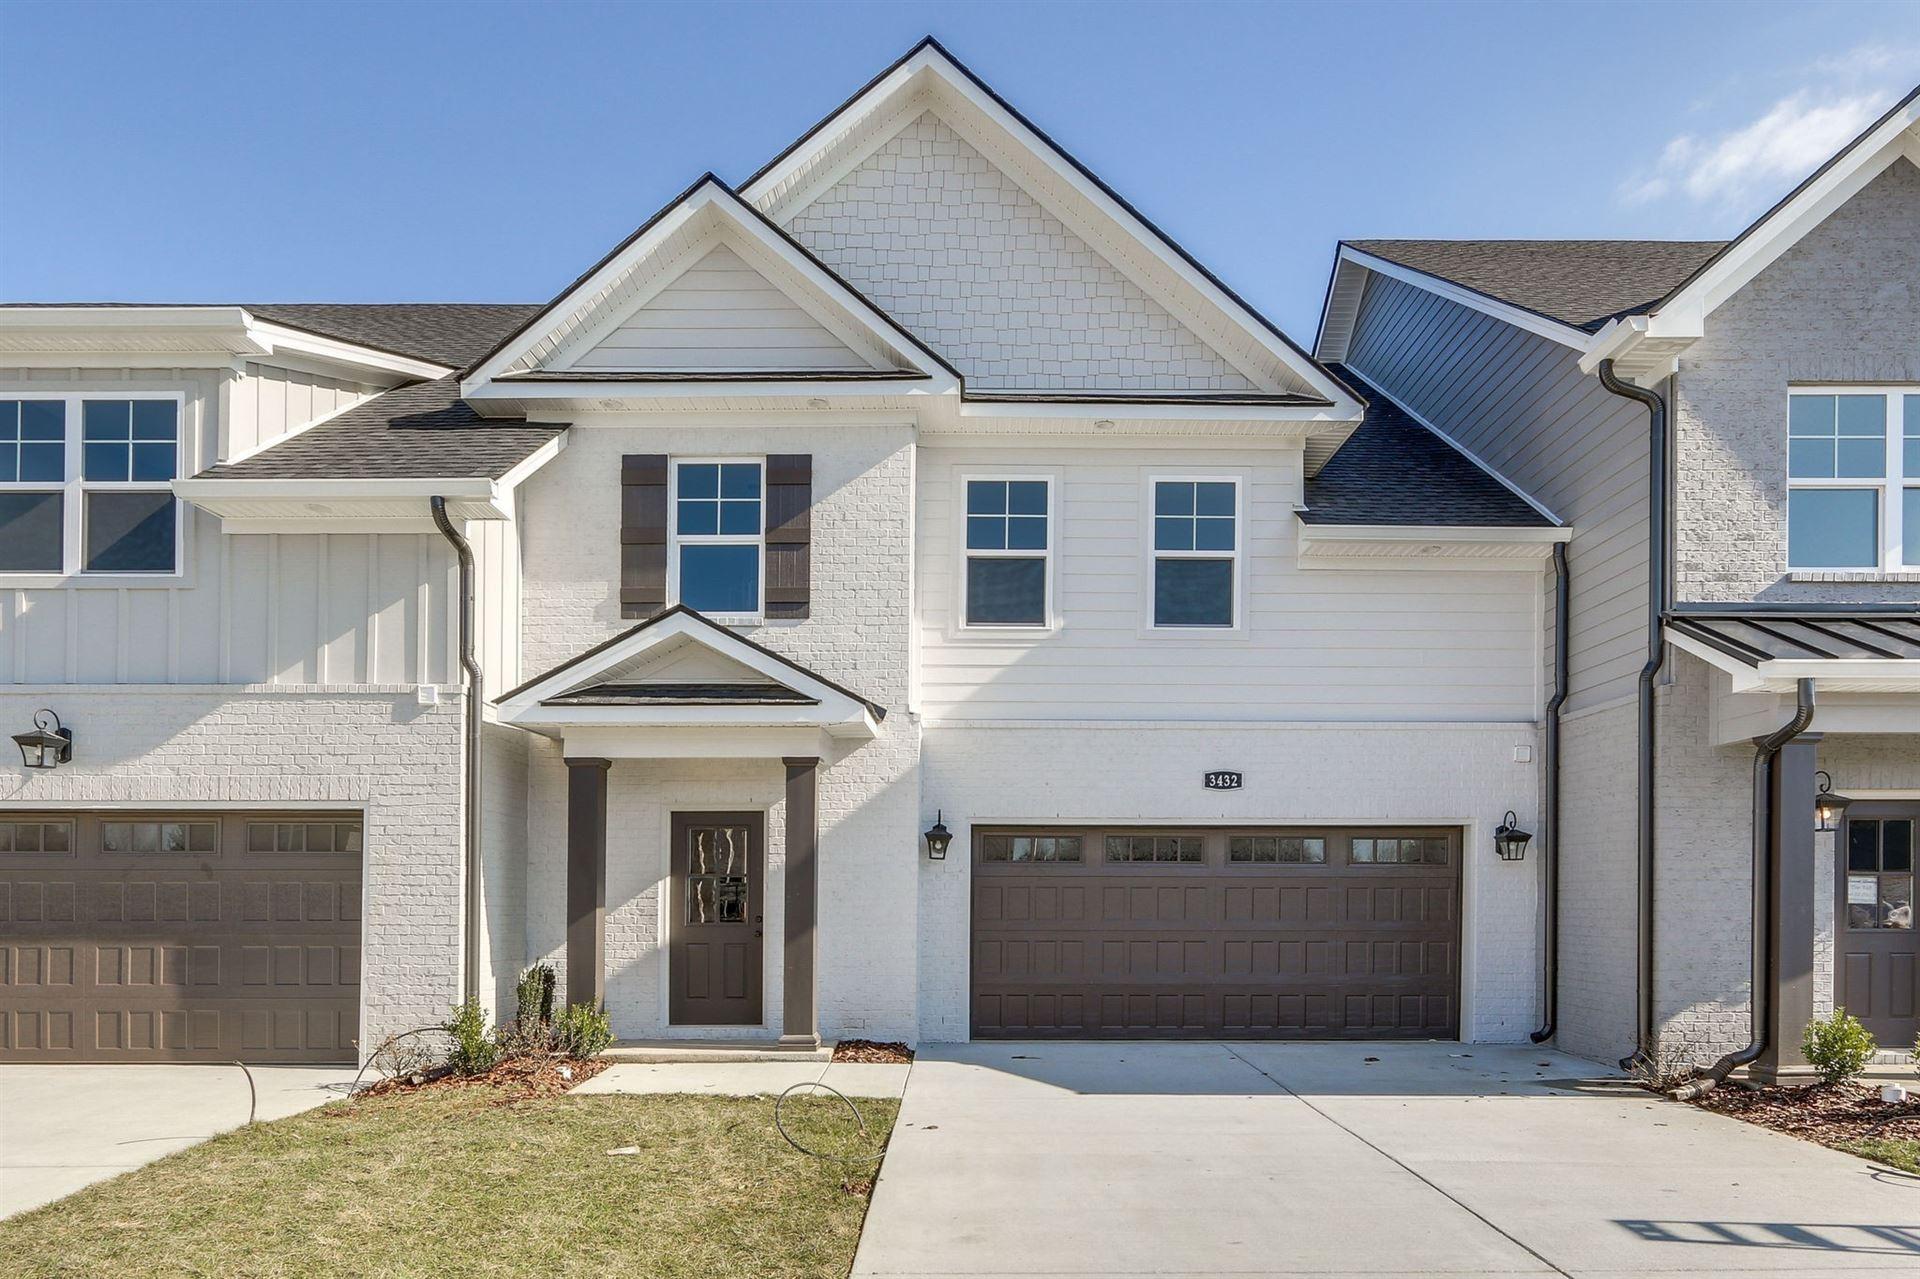 3504 Magruder Drive (N3), Murfreesboro, TN 37129 - MLS#: 2209638